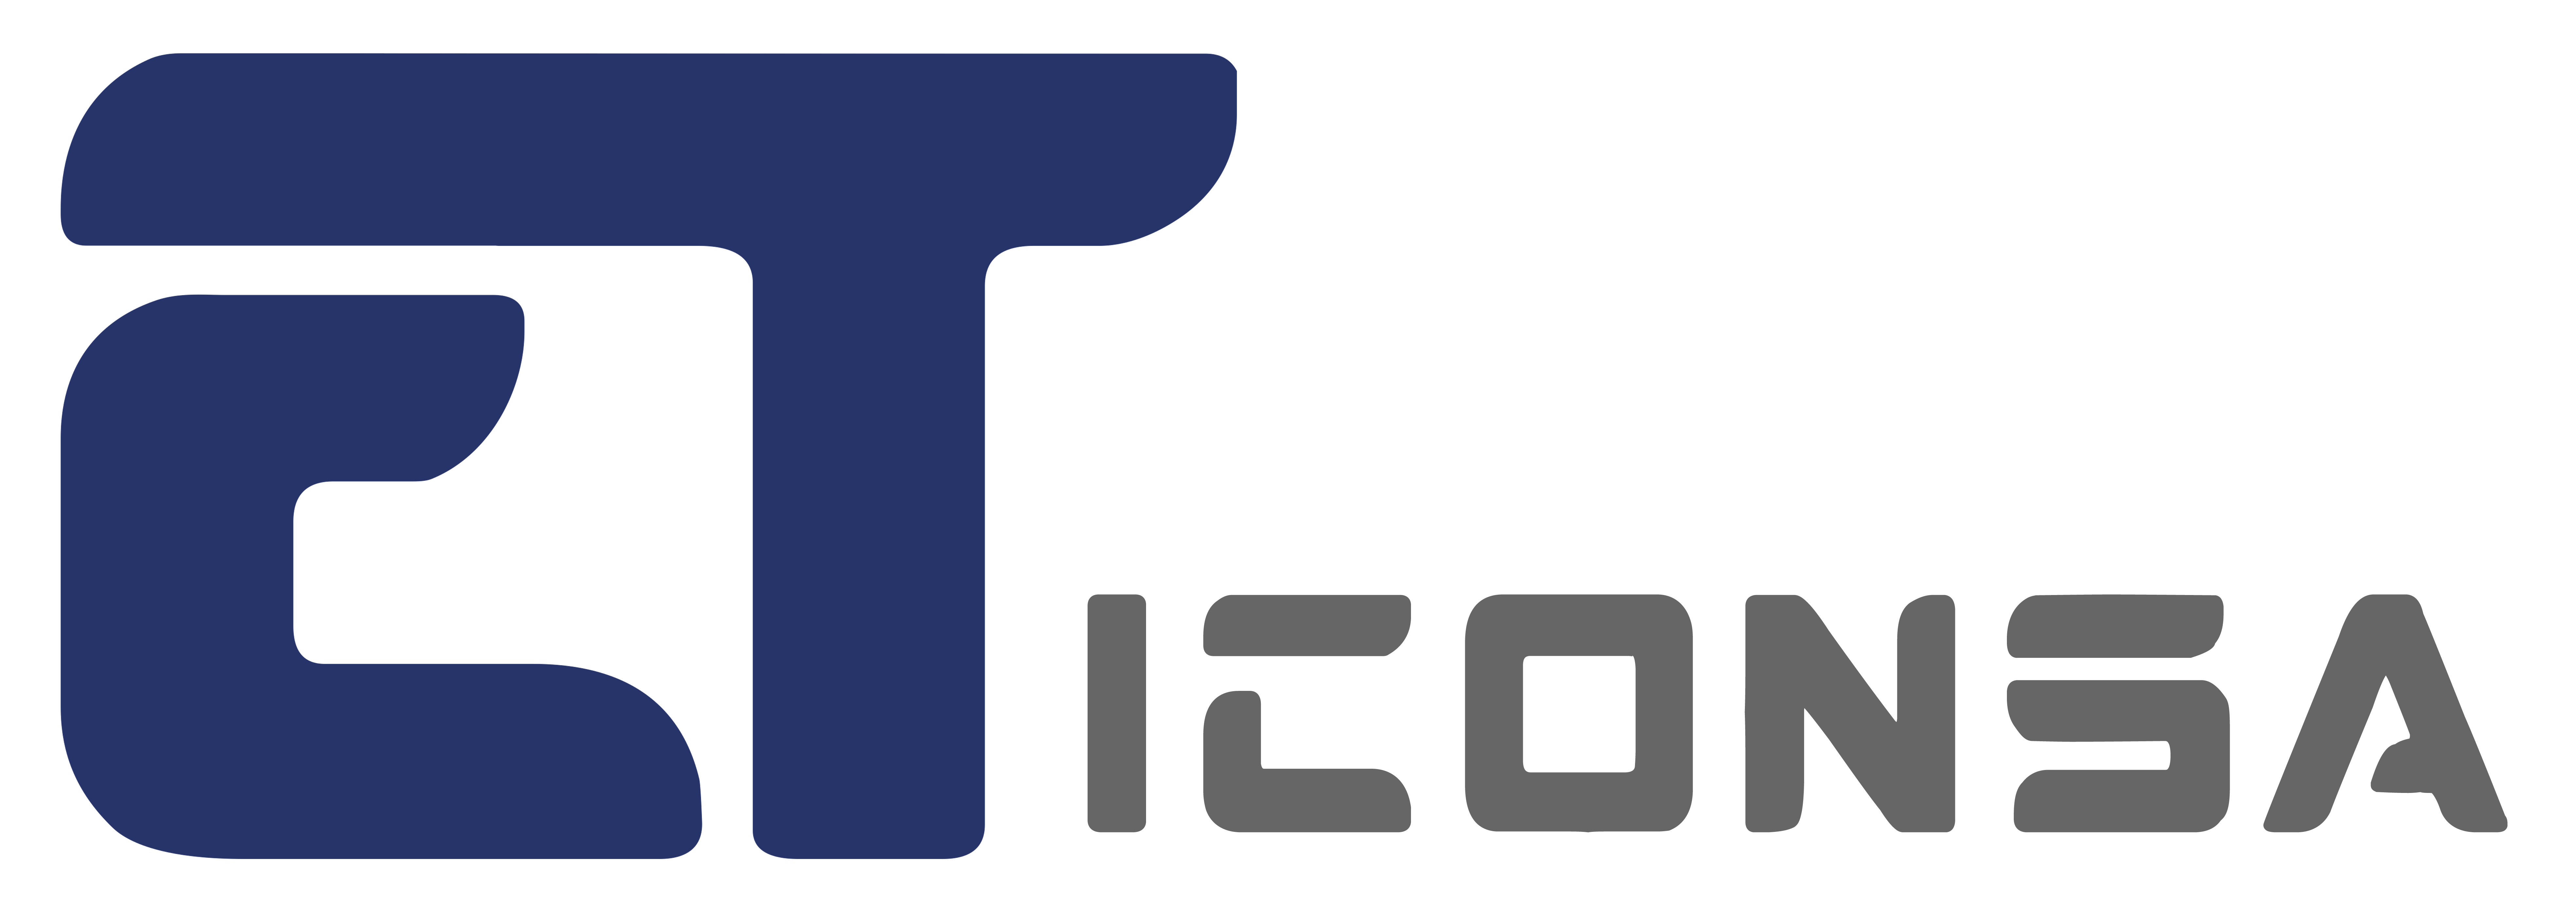 Eticonsa Informática - TPV en Cádiz y servicios informáticos